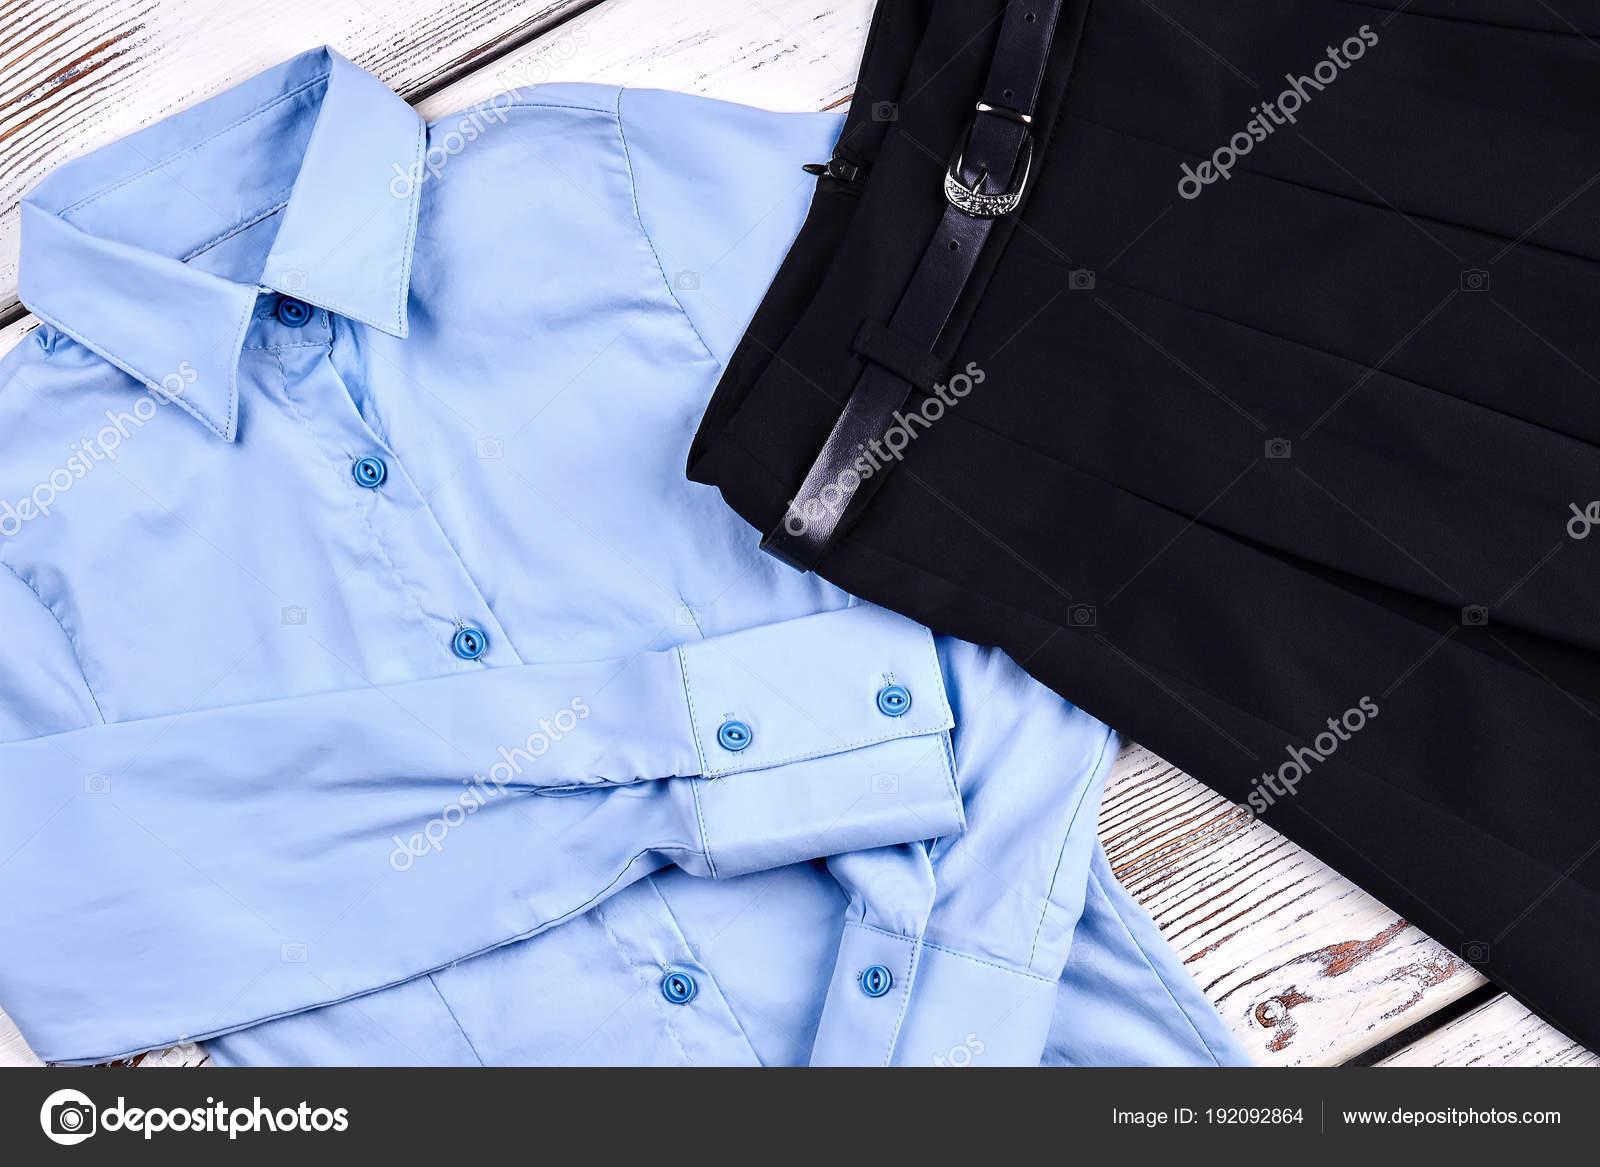 11c92c748 Blusa de escuela de niñas de alta calidad. — Fotos de Stock ...